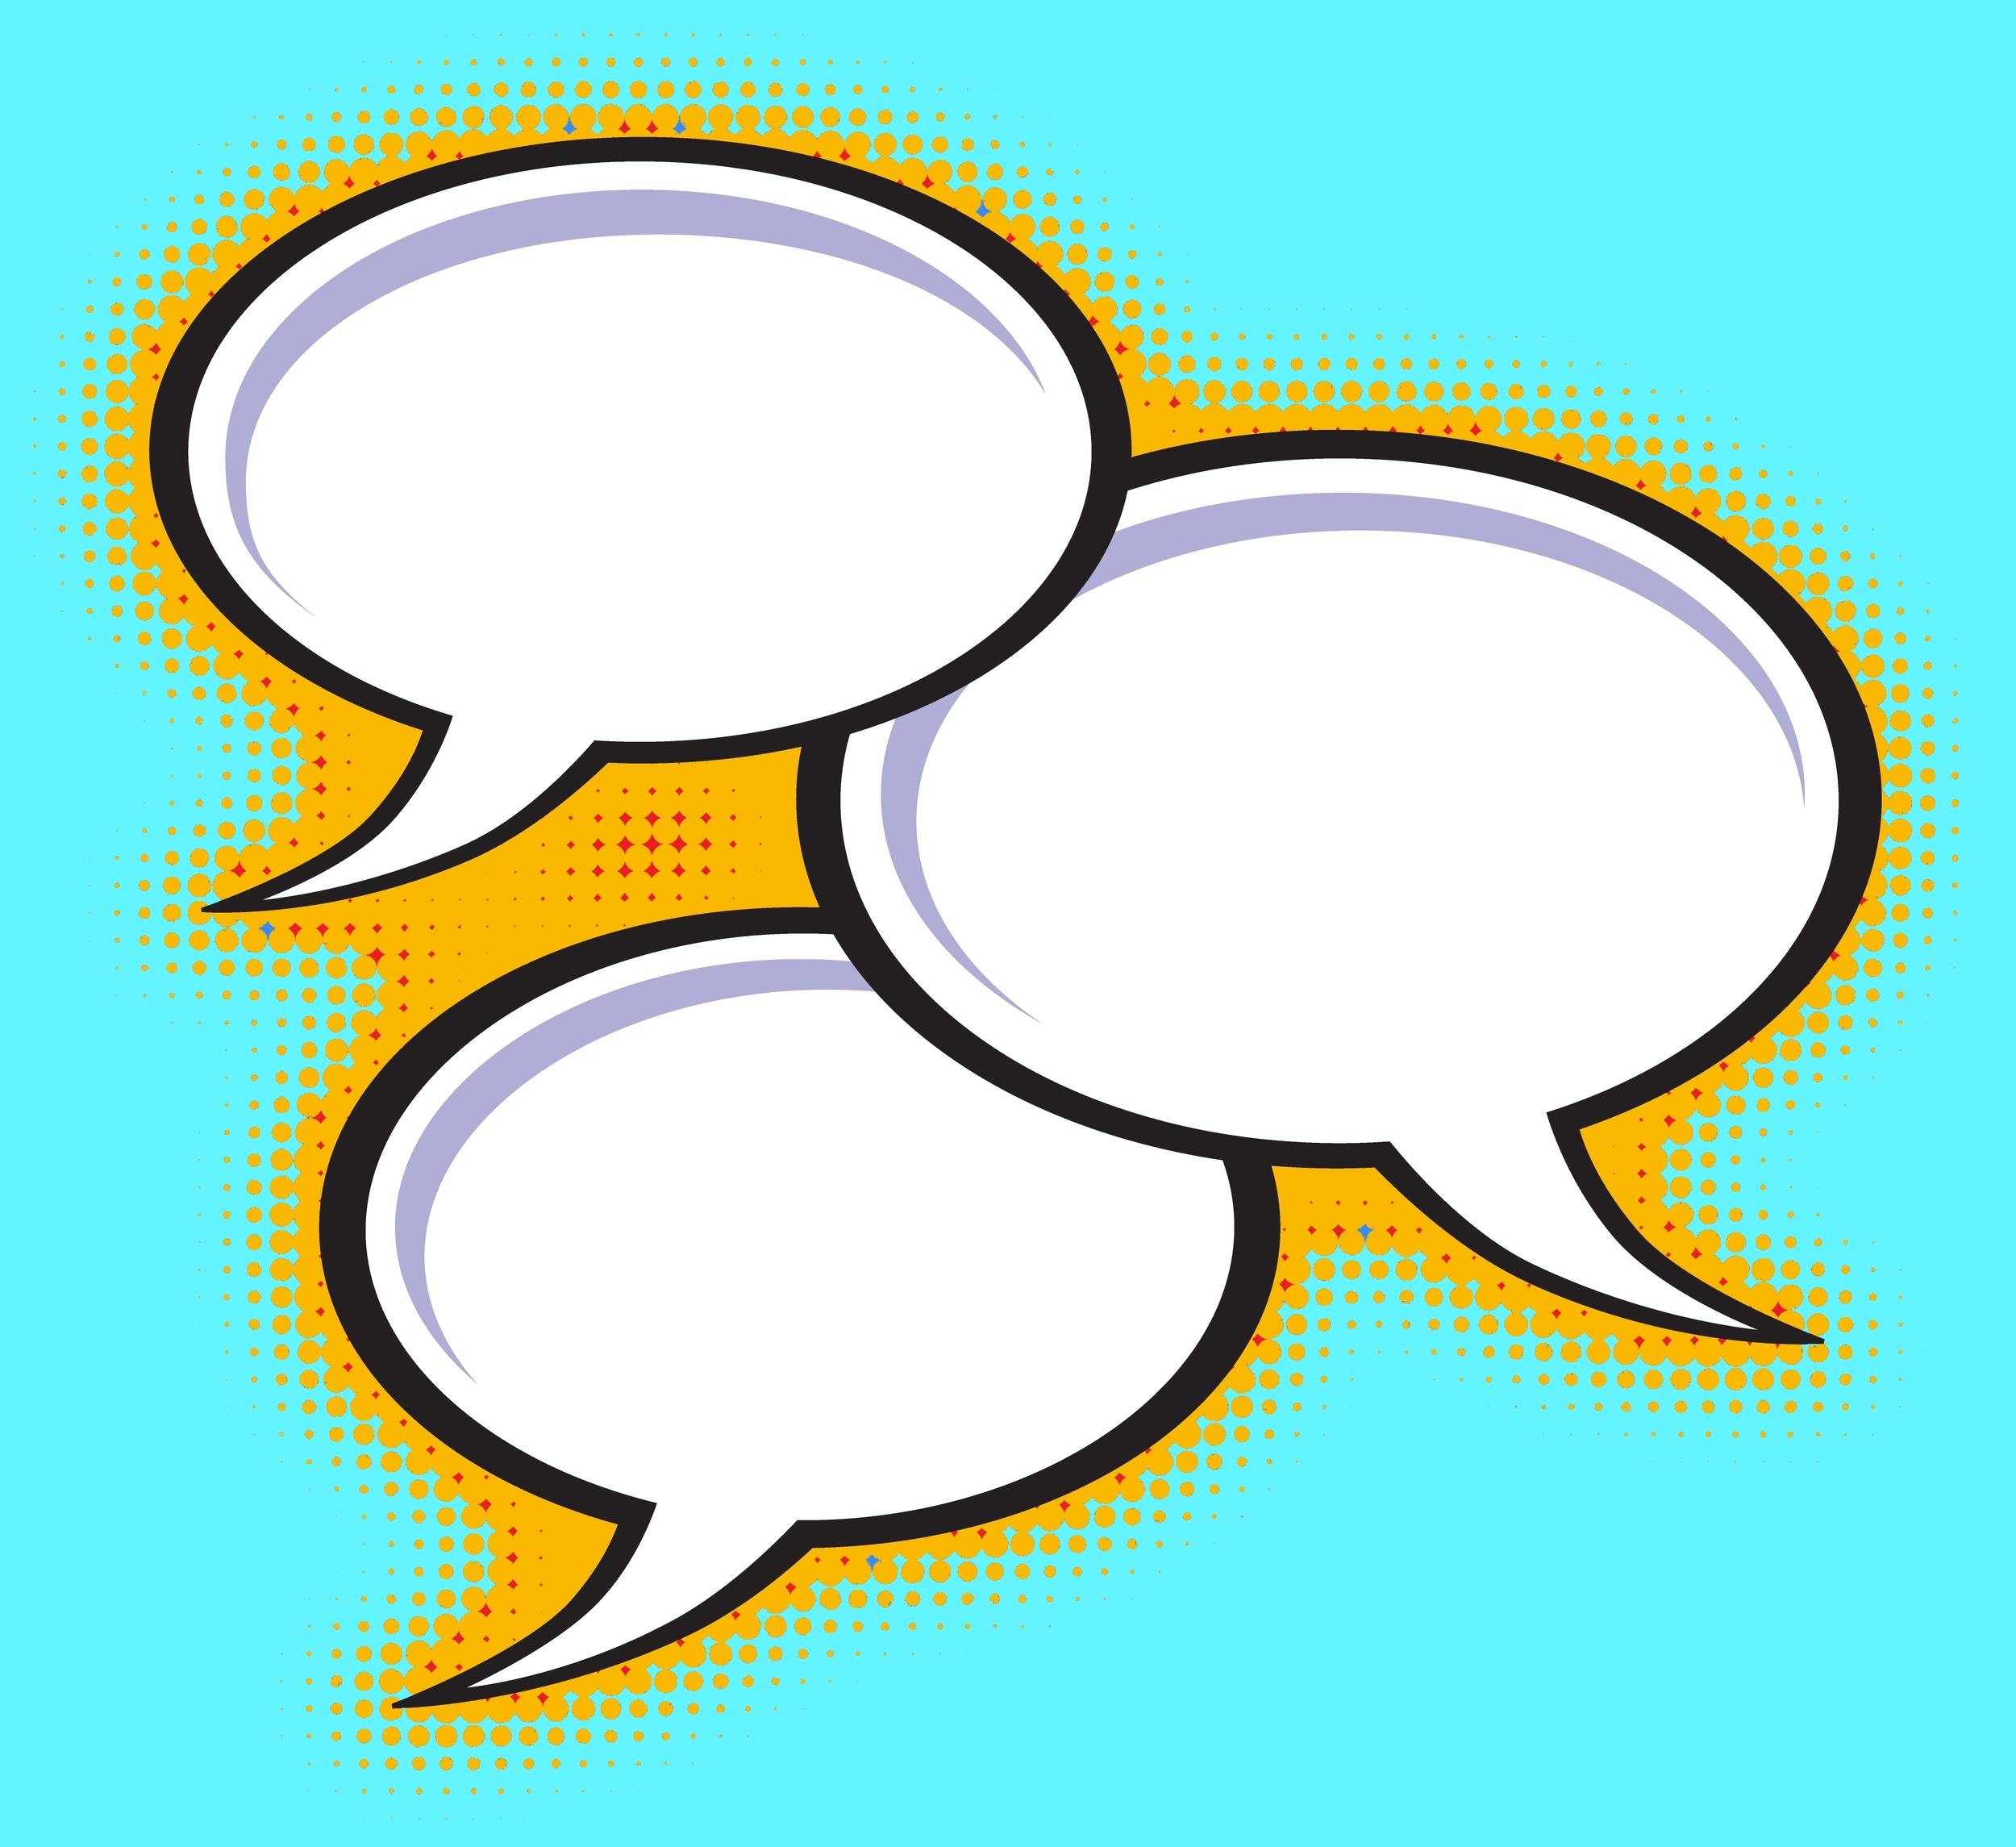 Testimonials and endorsements